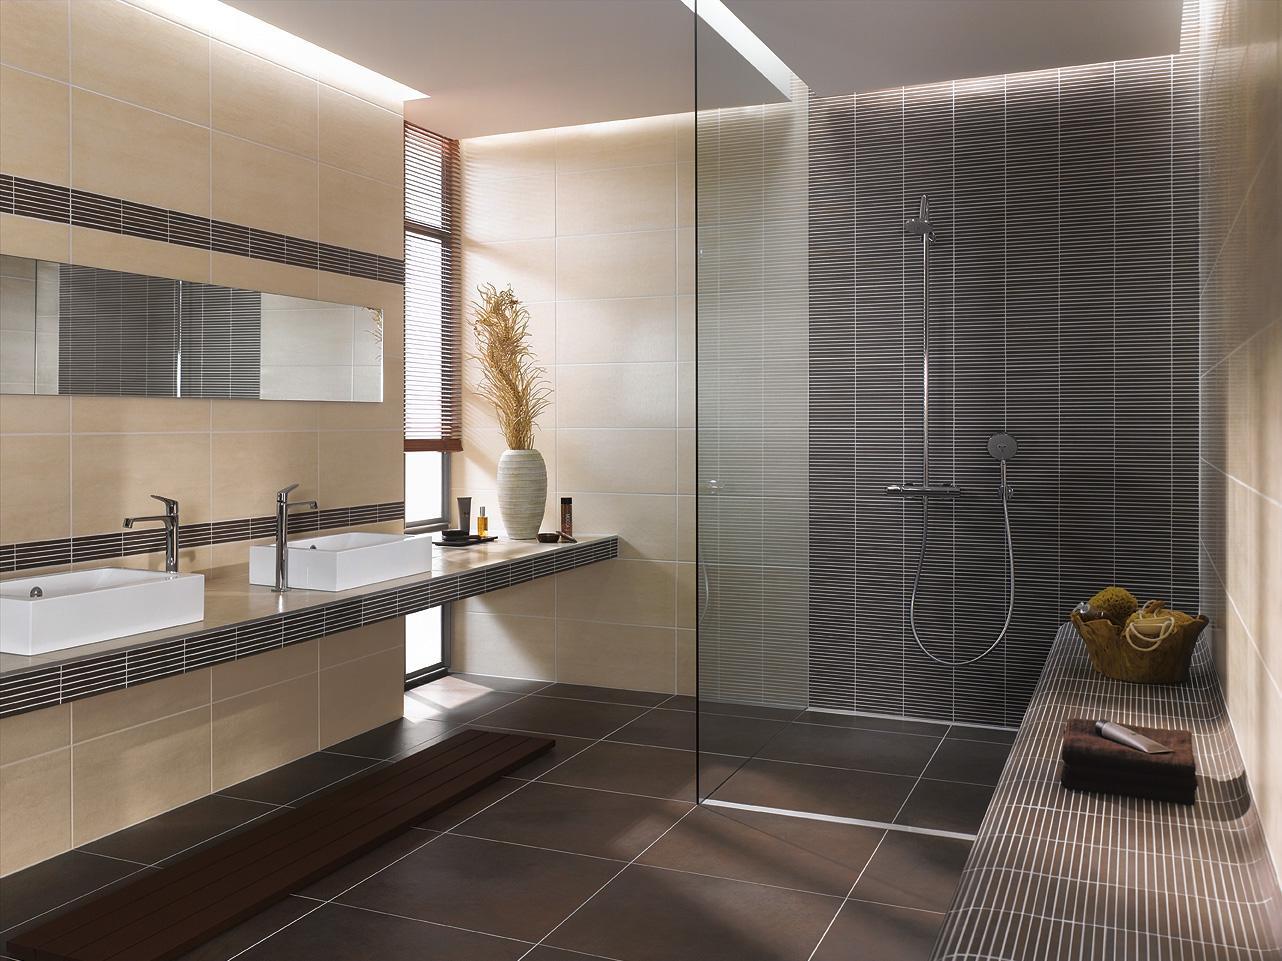 barrierefrei fliesen winter. Black Bedroom Furniture Sets. Home Design Ideas